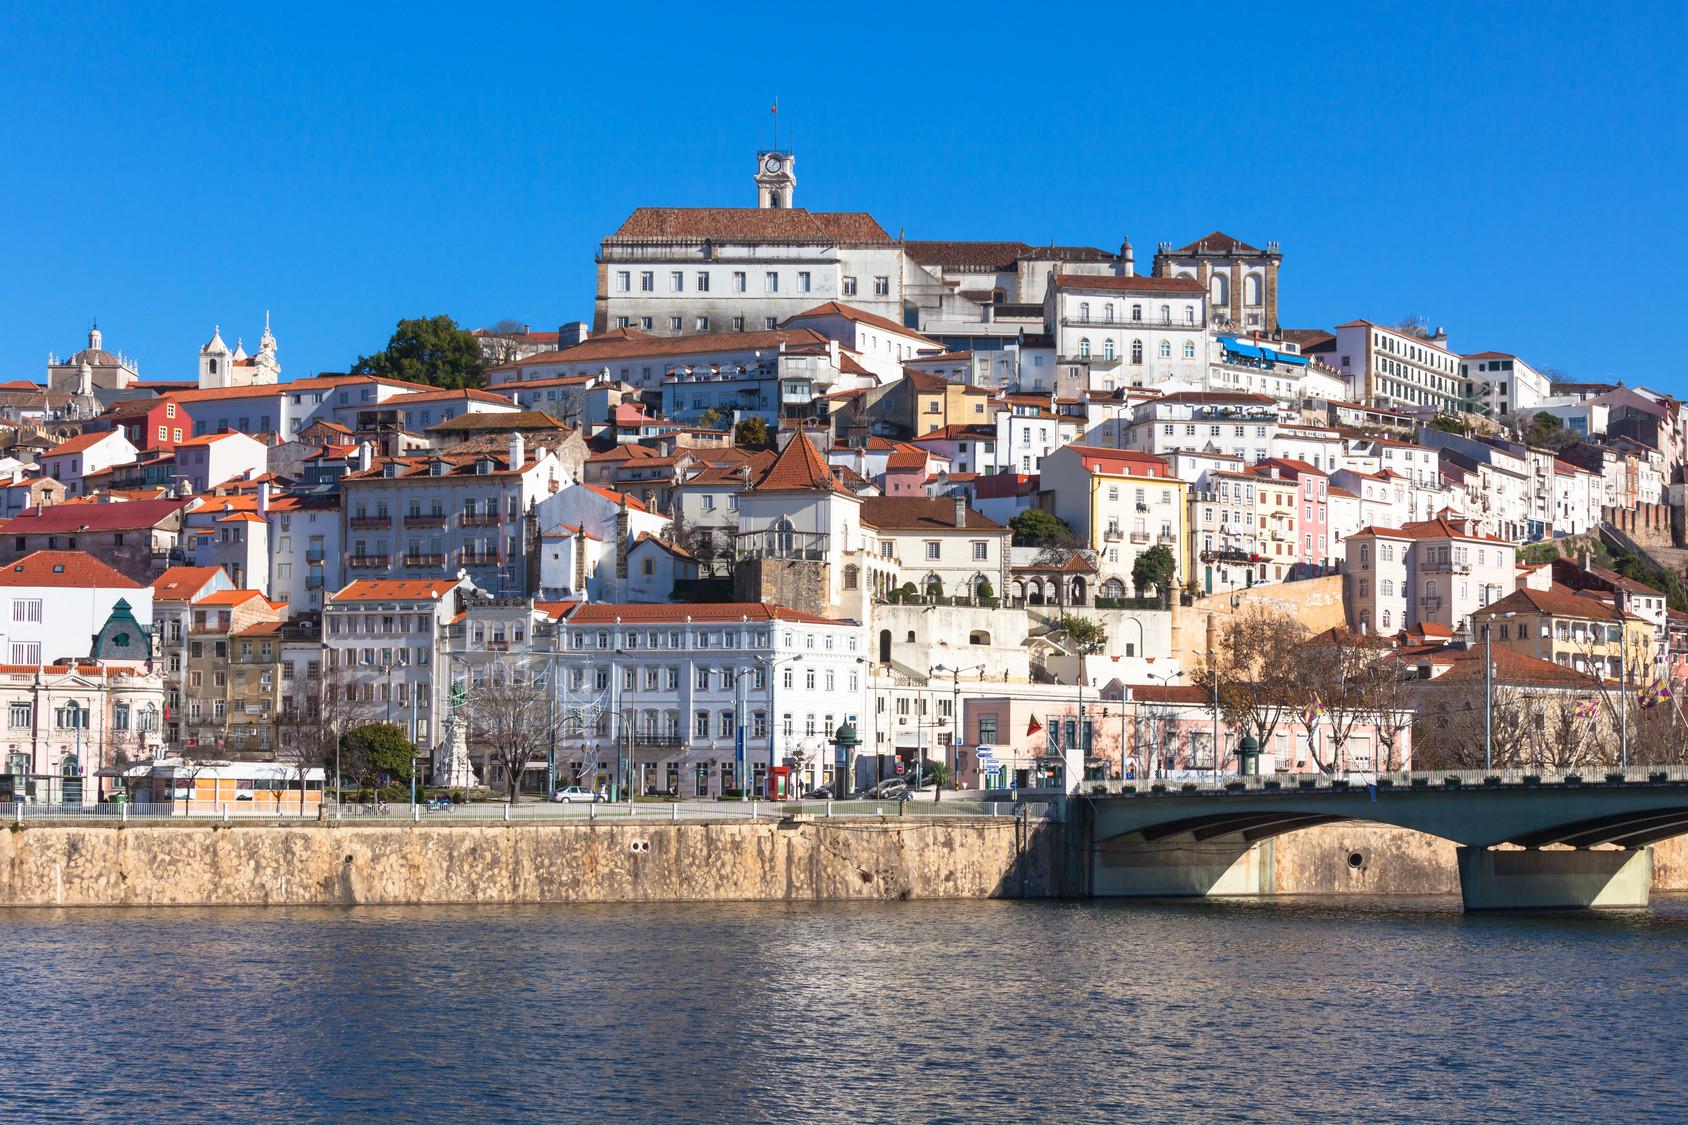 Experiencia en Coimbra, Portugal por Vanessa